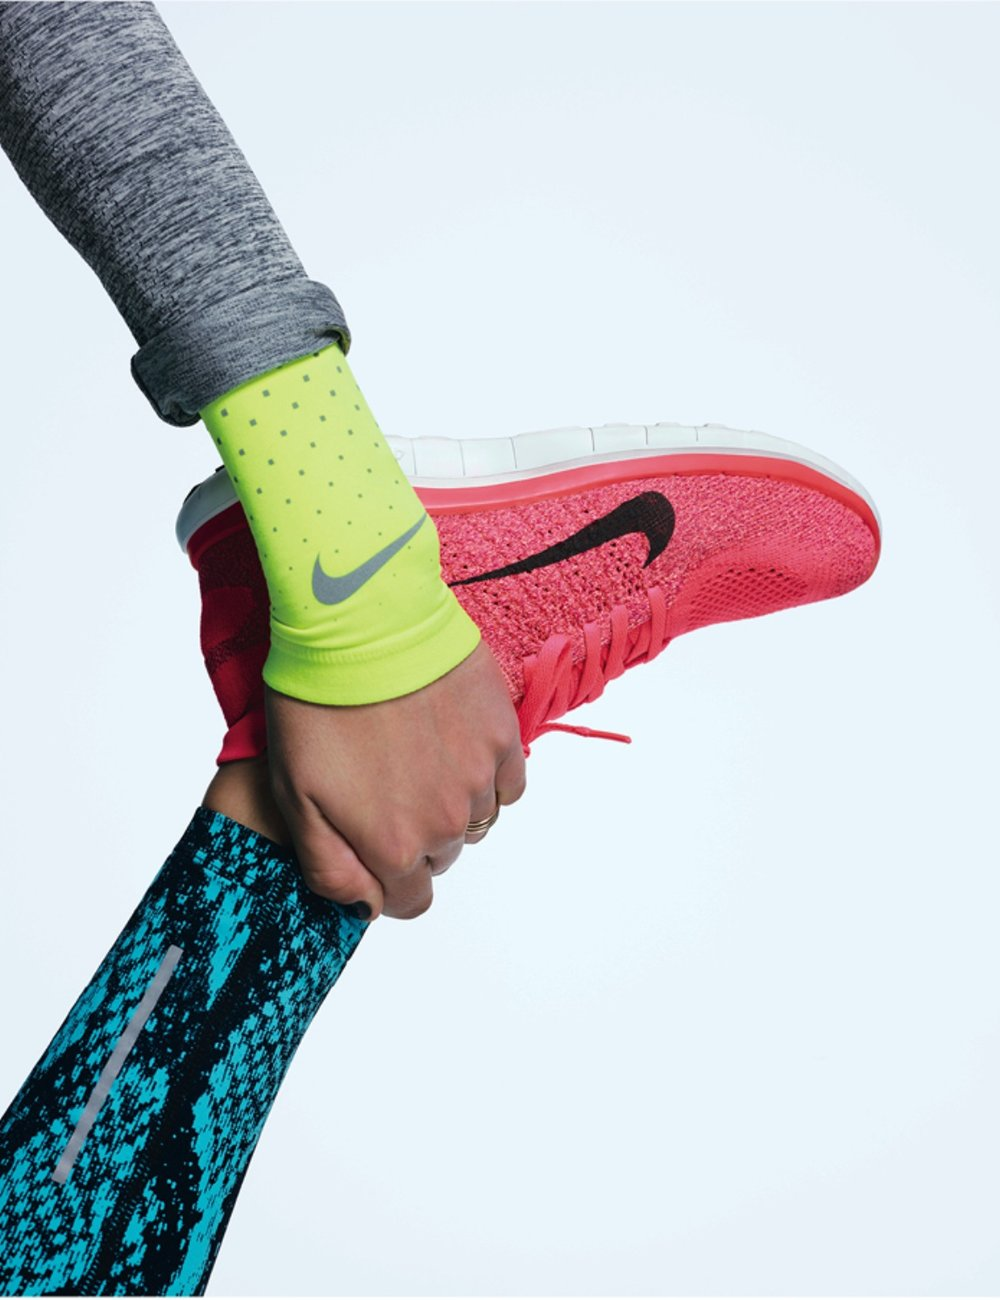 Nike Women's Style Guide  |  Art Direction : Lisa Hopey |  Photo:  Mel Bles